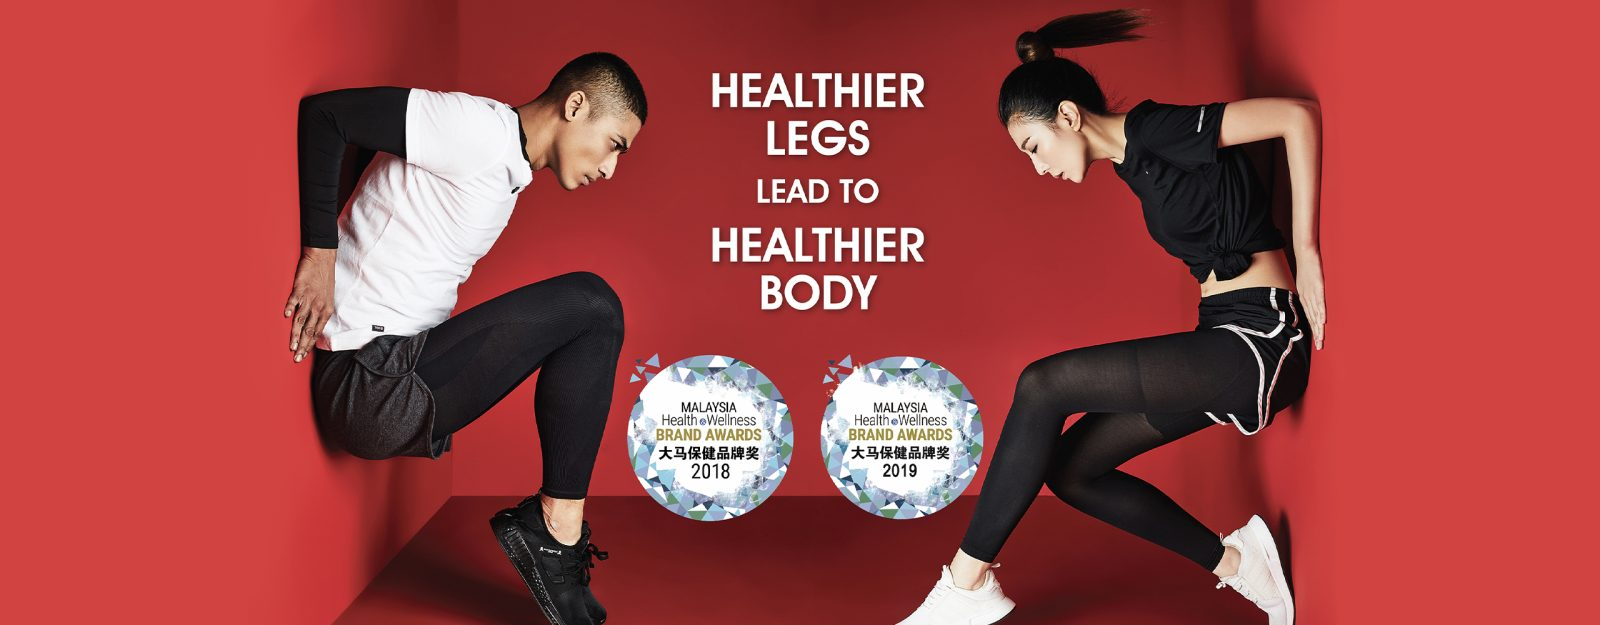 Aulora pants - Malaysia Health and Wellness brands 2018 2019